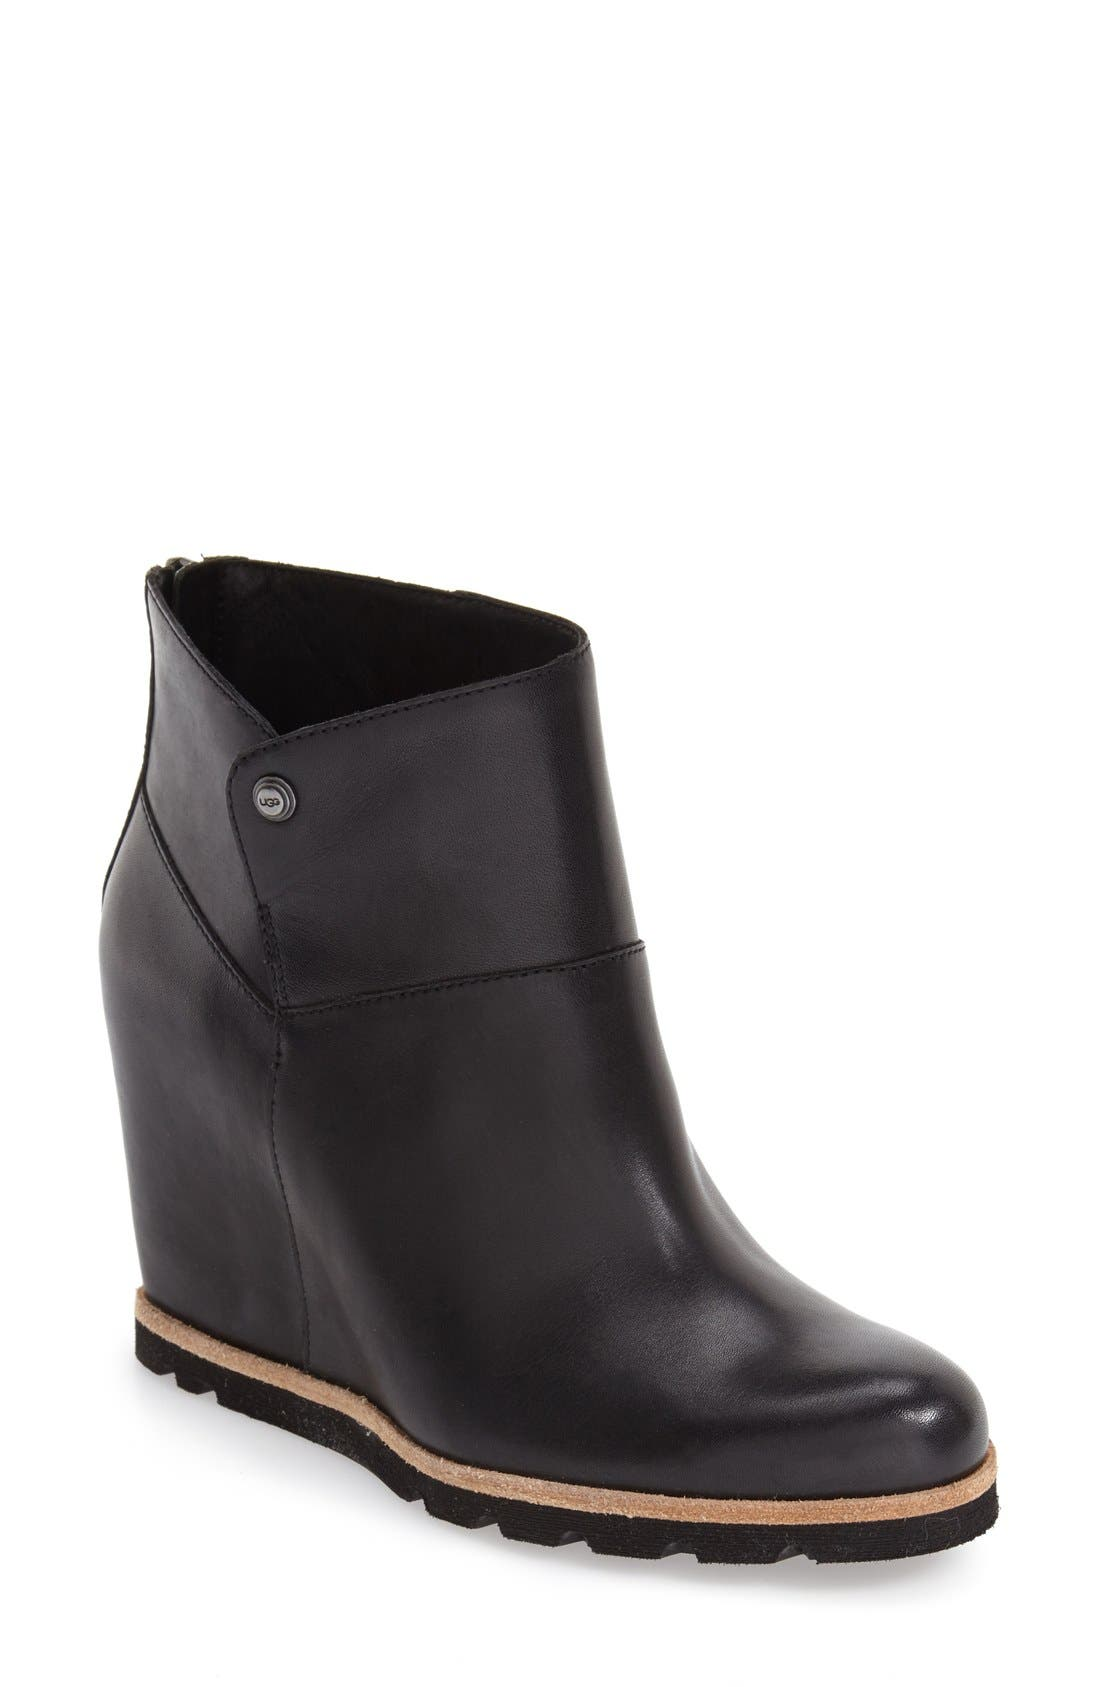 Main Image - UGG® 'Amal' Wedge Boot (Women)